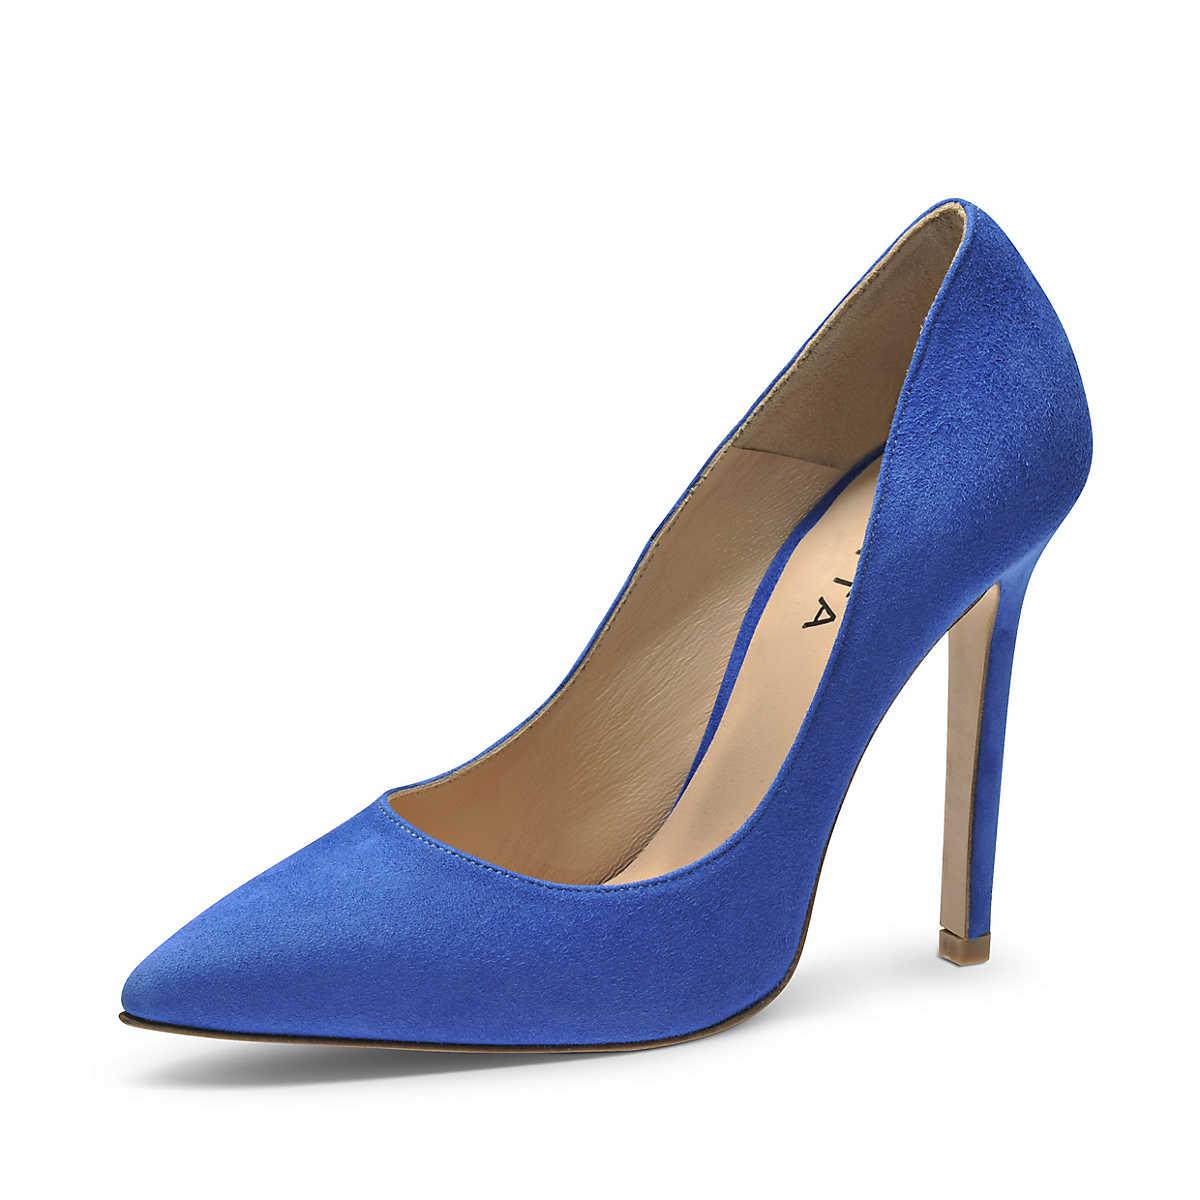 Evita Shoes Pumps blau - Evita Shoes - Pumps - Schuhe - mirapodo.de